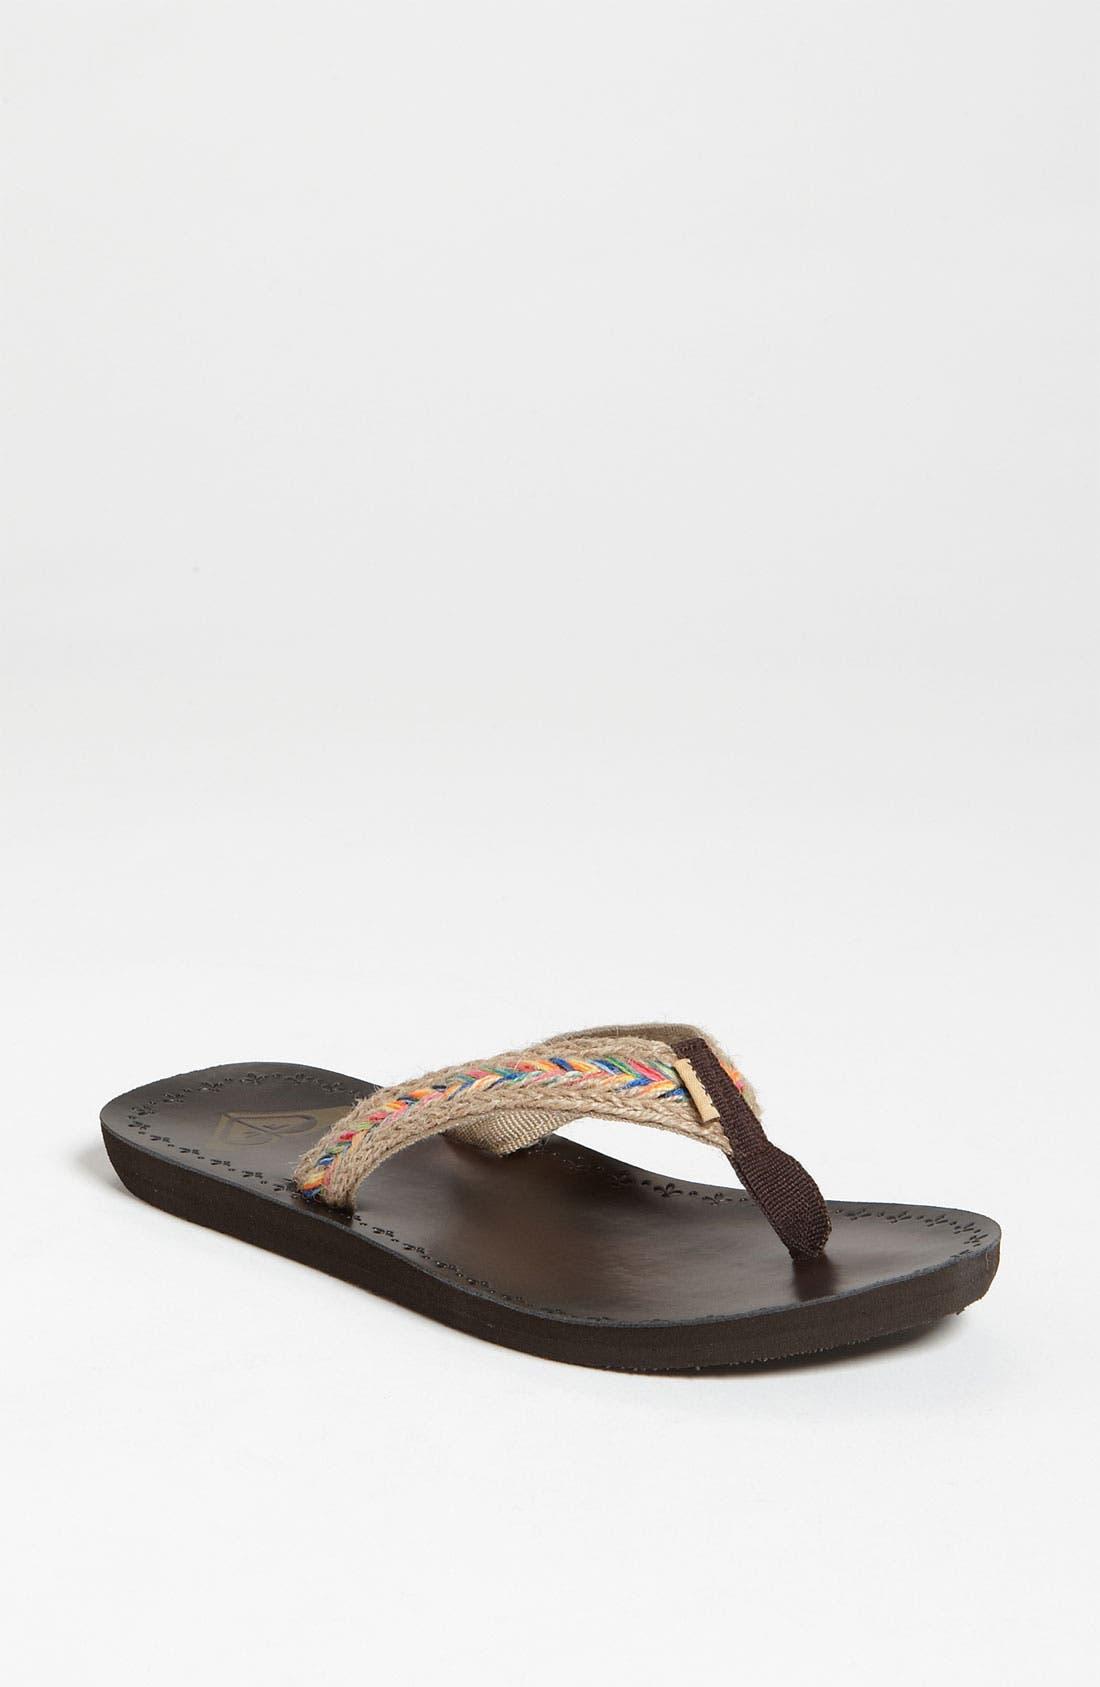 Alternate Image 1 Selected - Roxy 'Fiji' Flip Flop